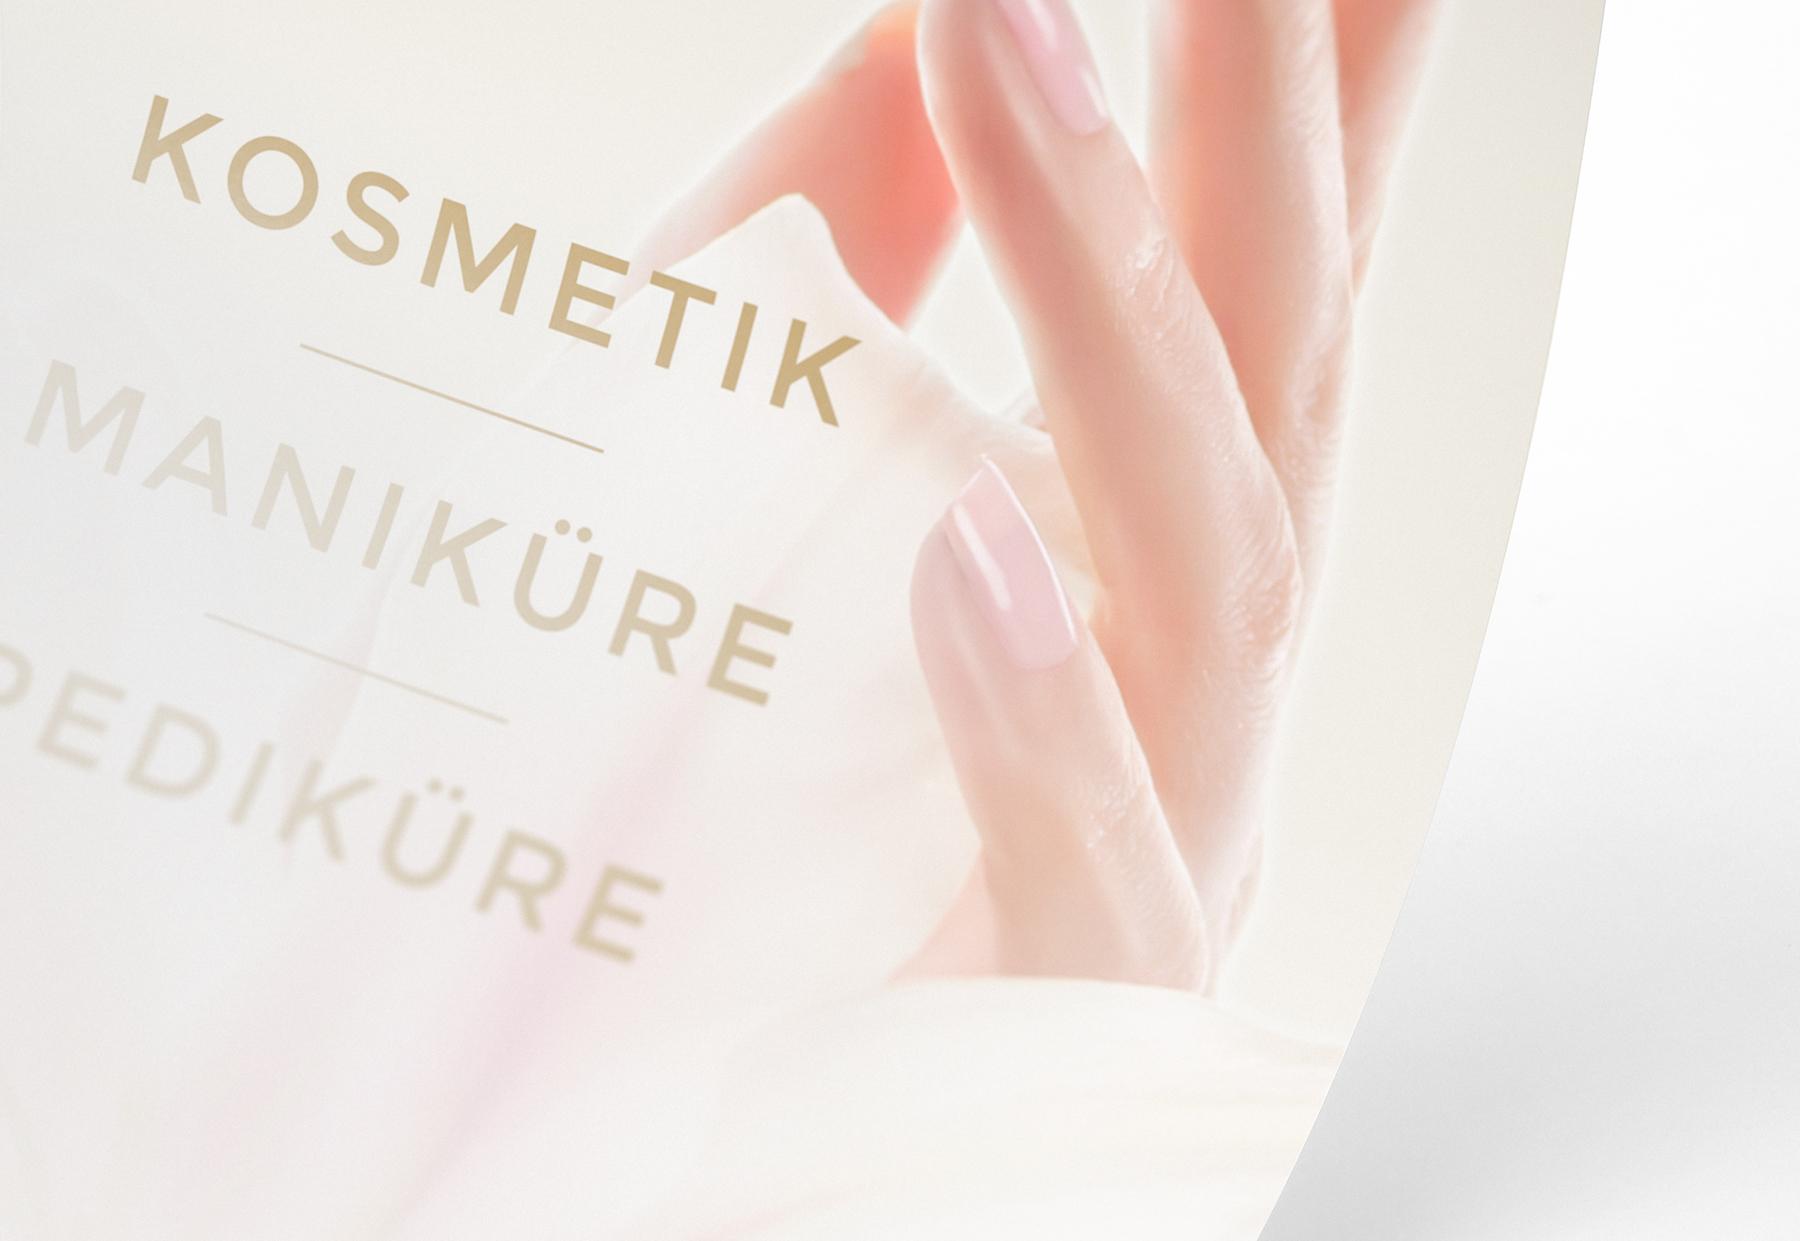 Drucksachen Kosmetikstudio